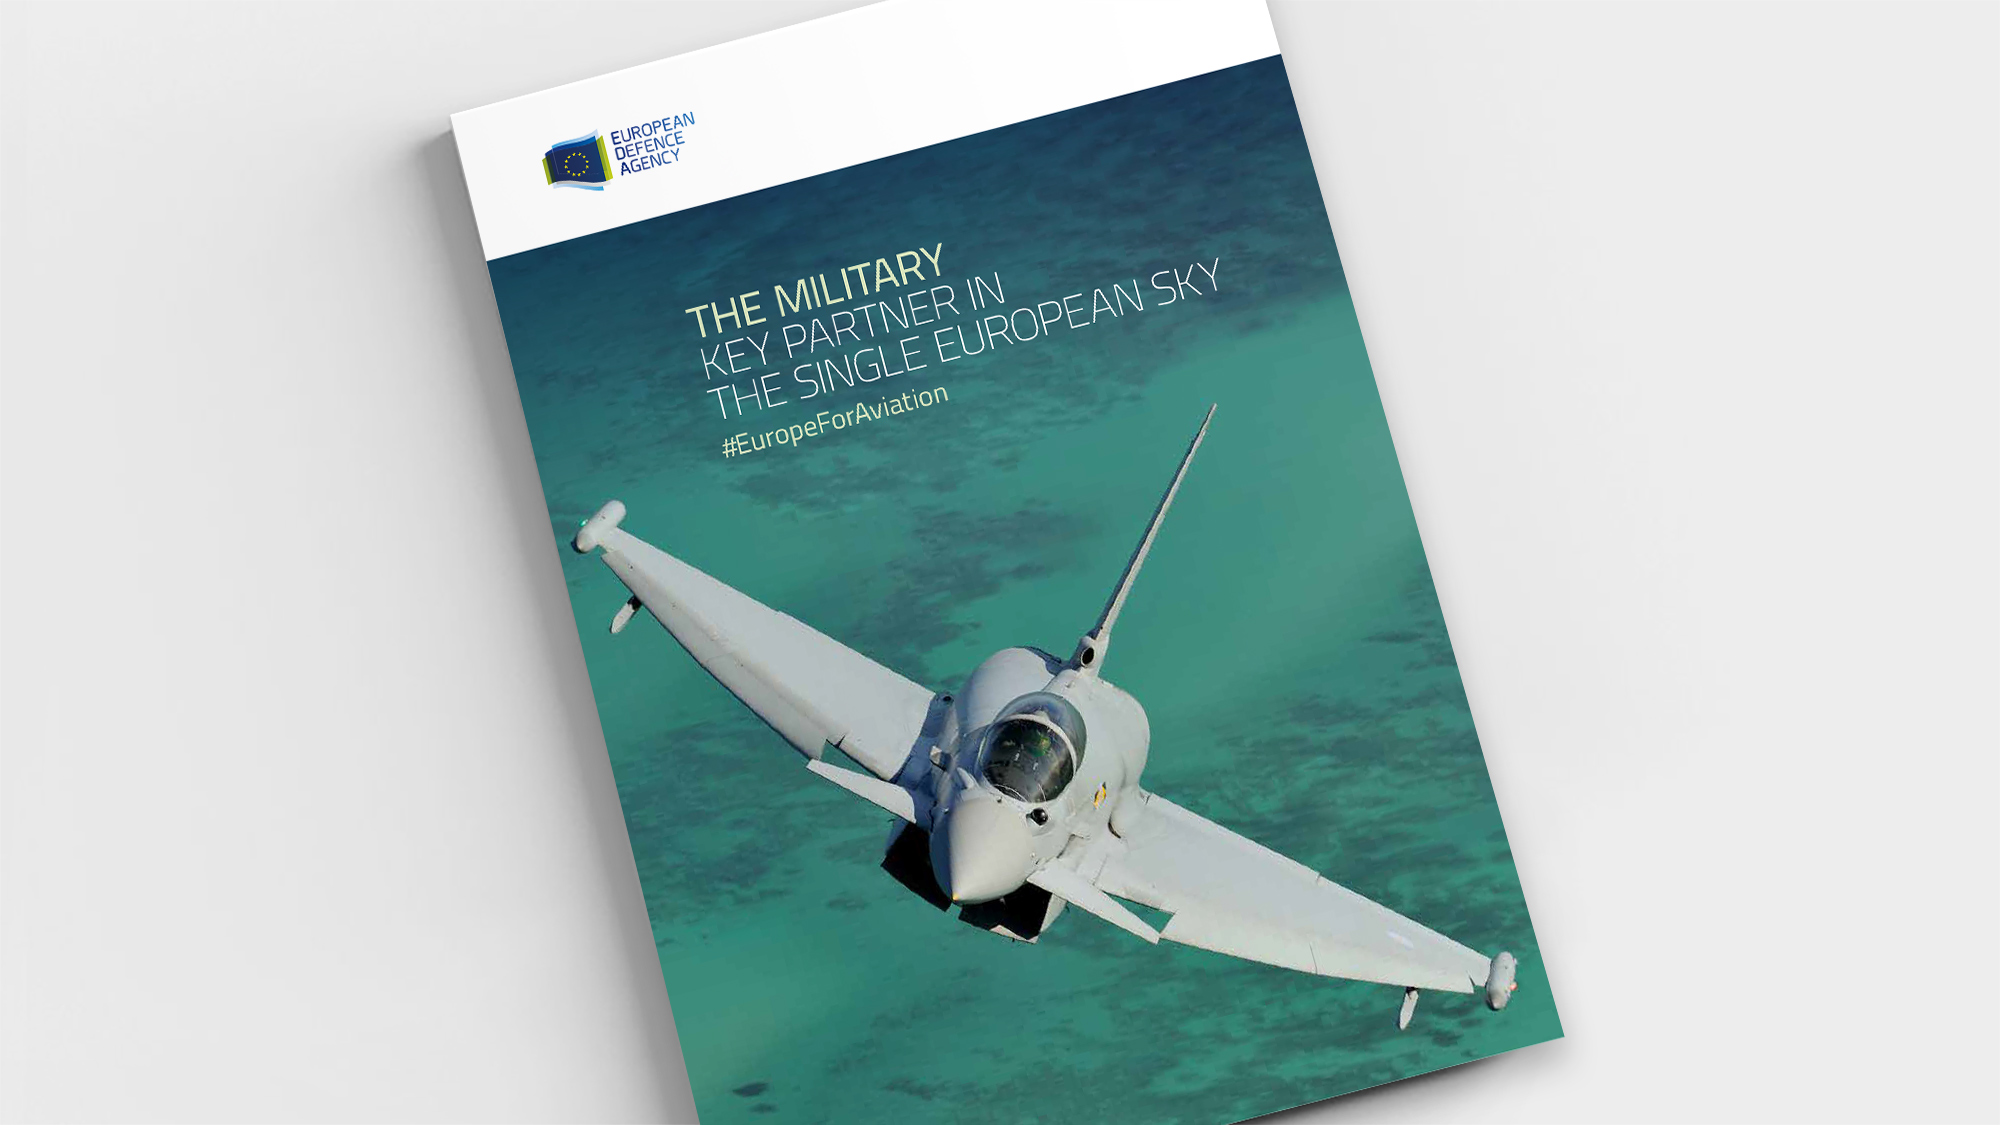 The Military Key Partner In The Single European